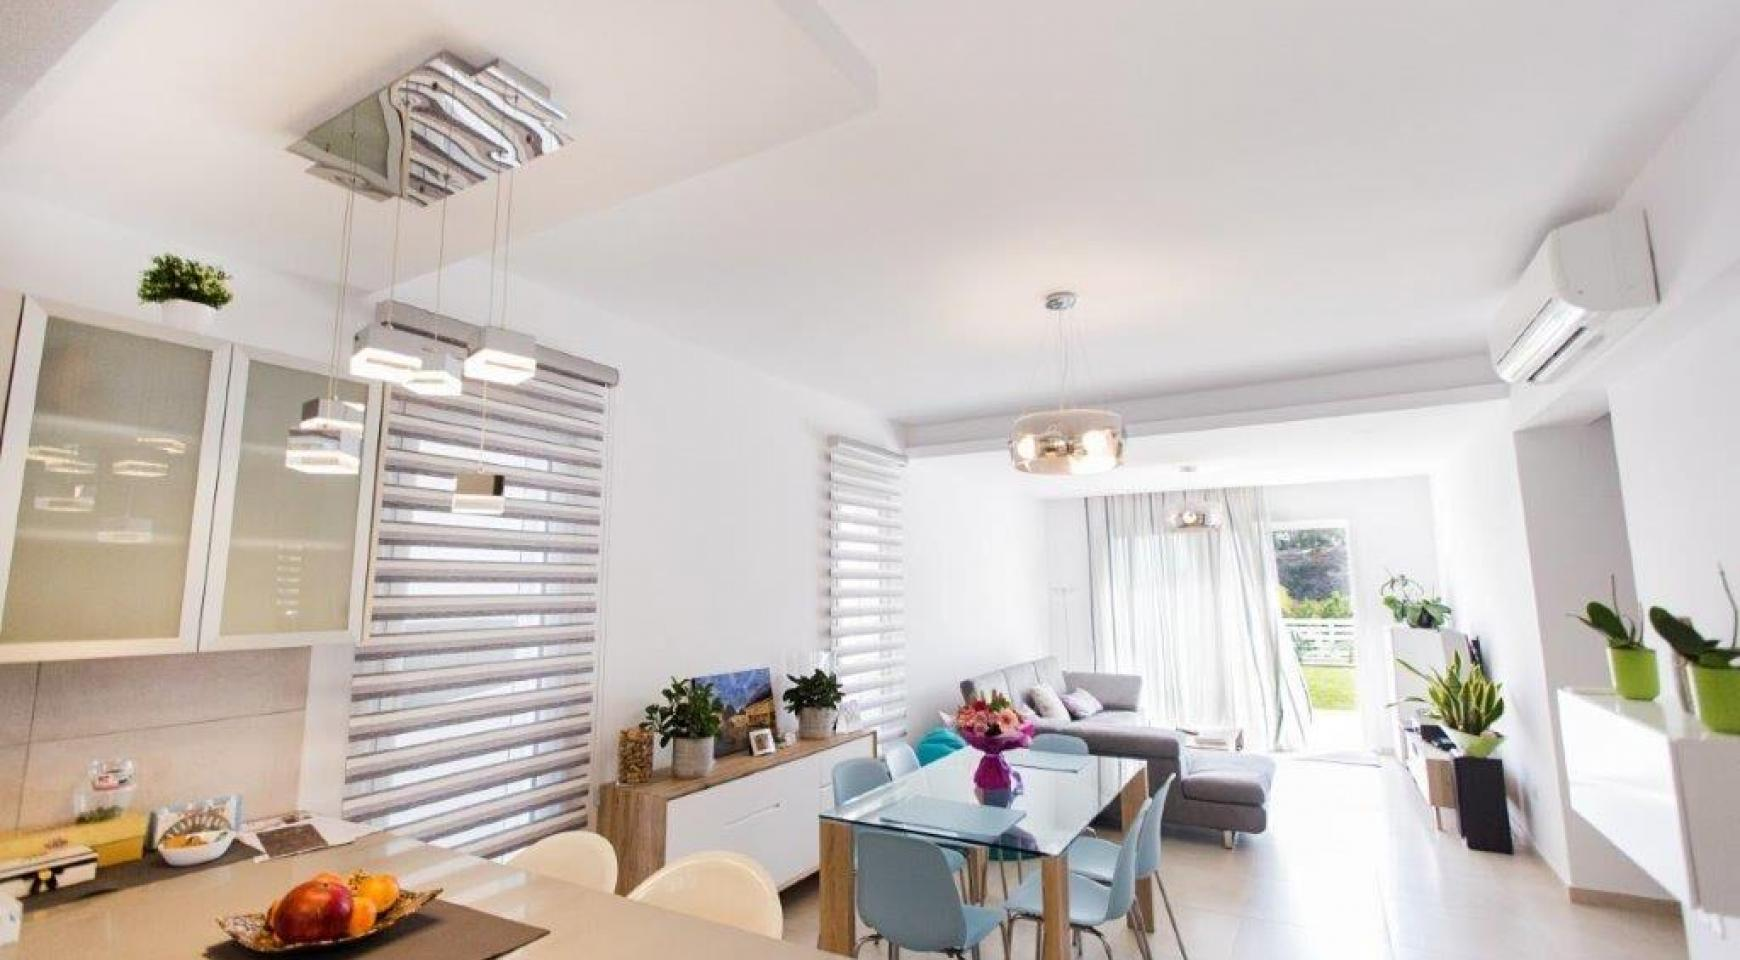 3 Bedroom Villa in Ipsonas Area - 4